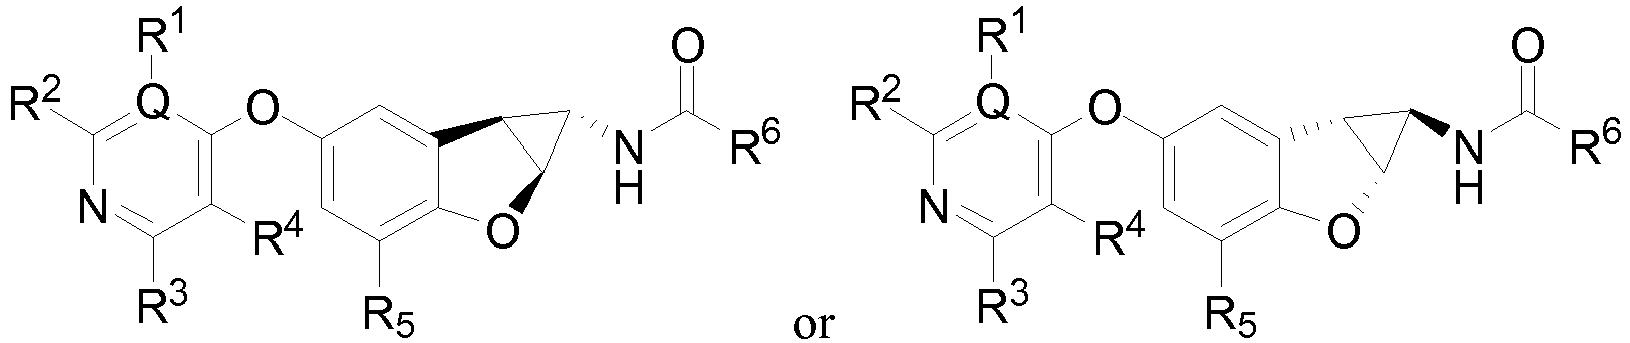 Figure imgb0346